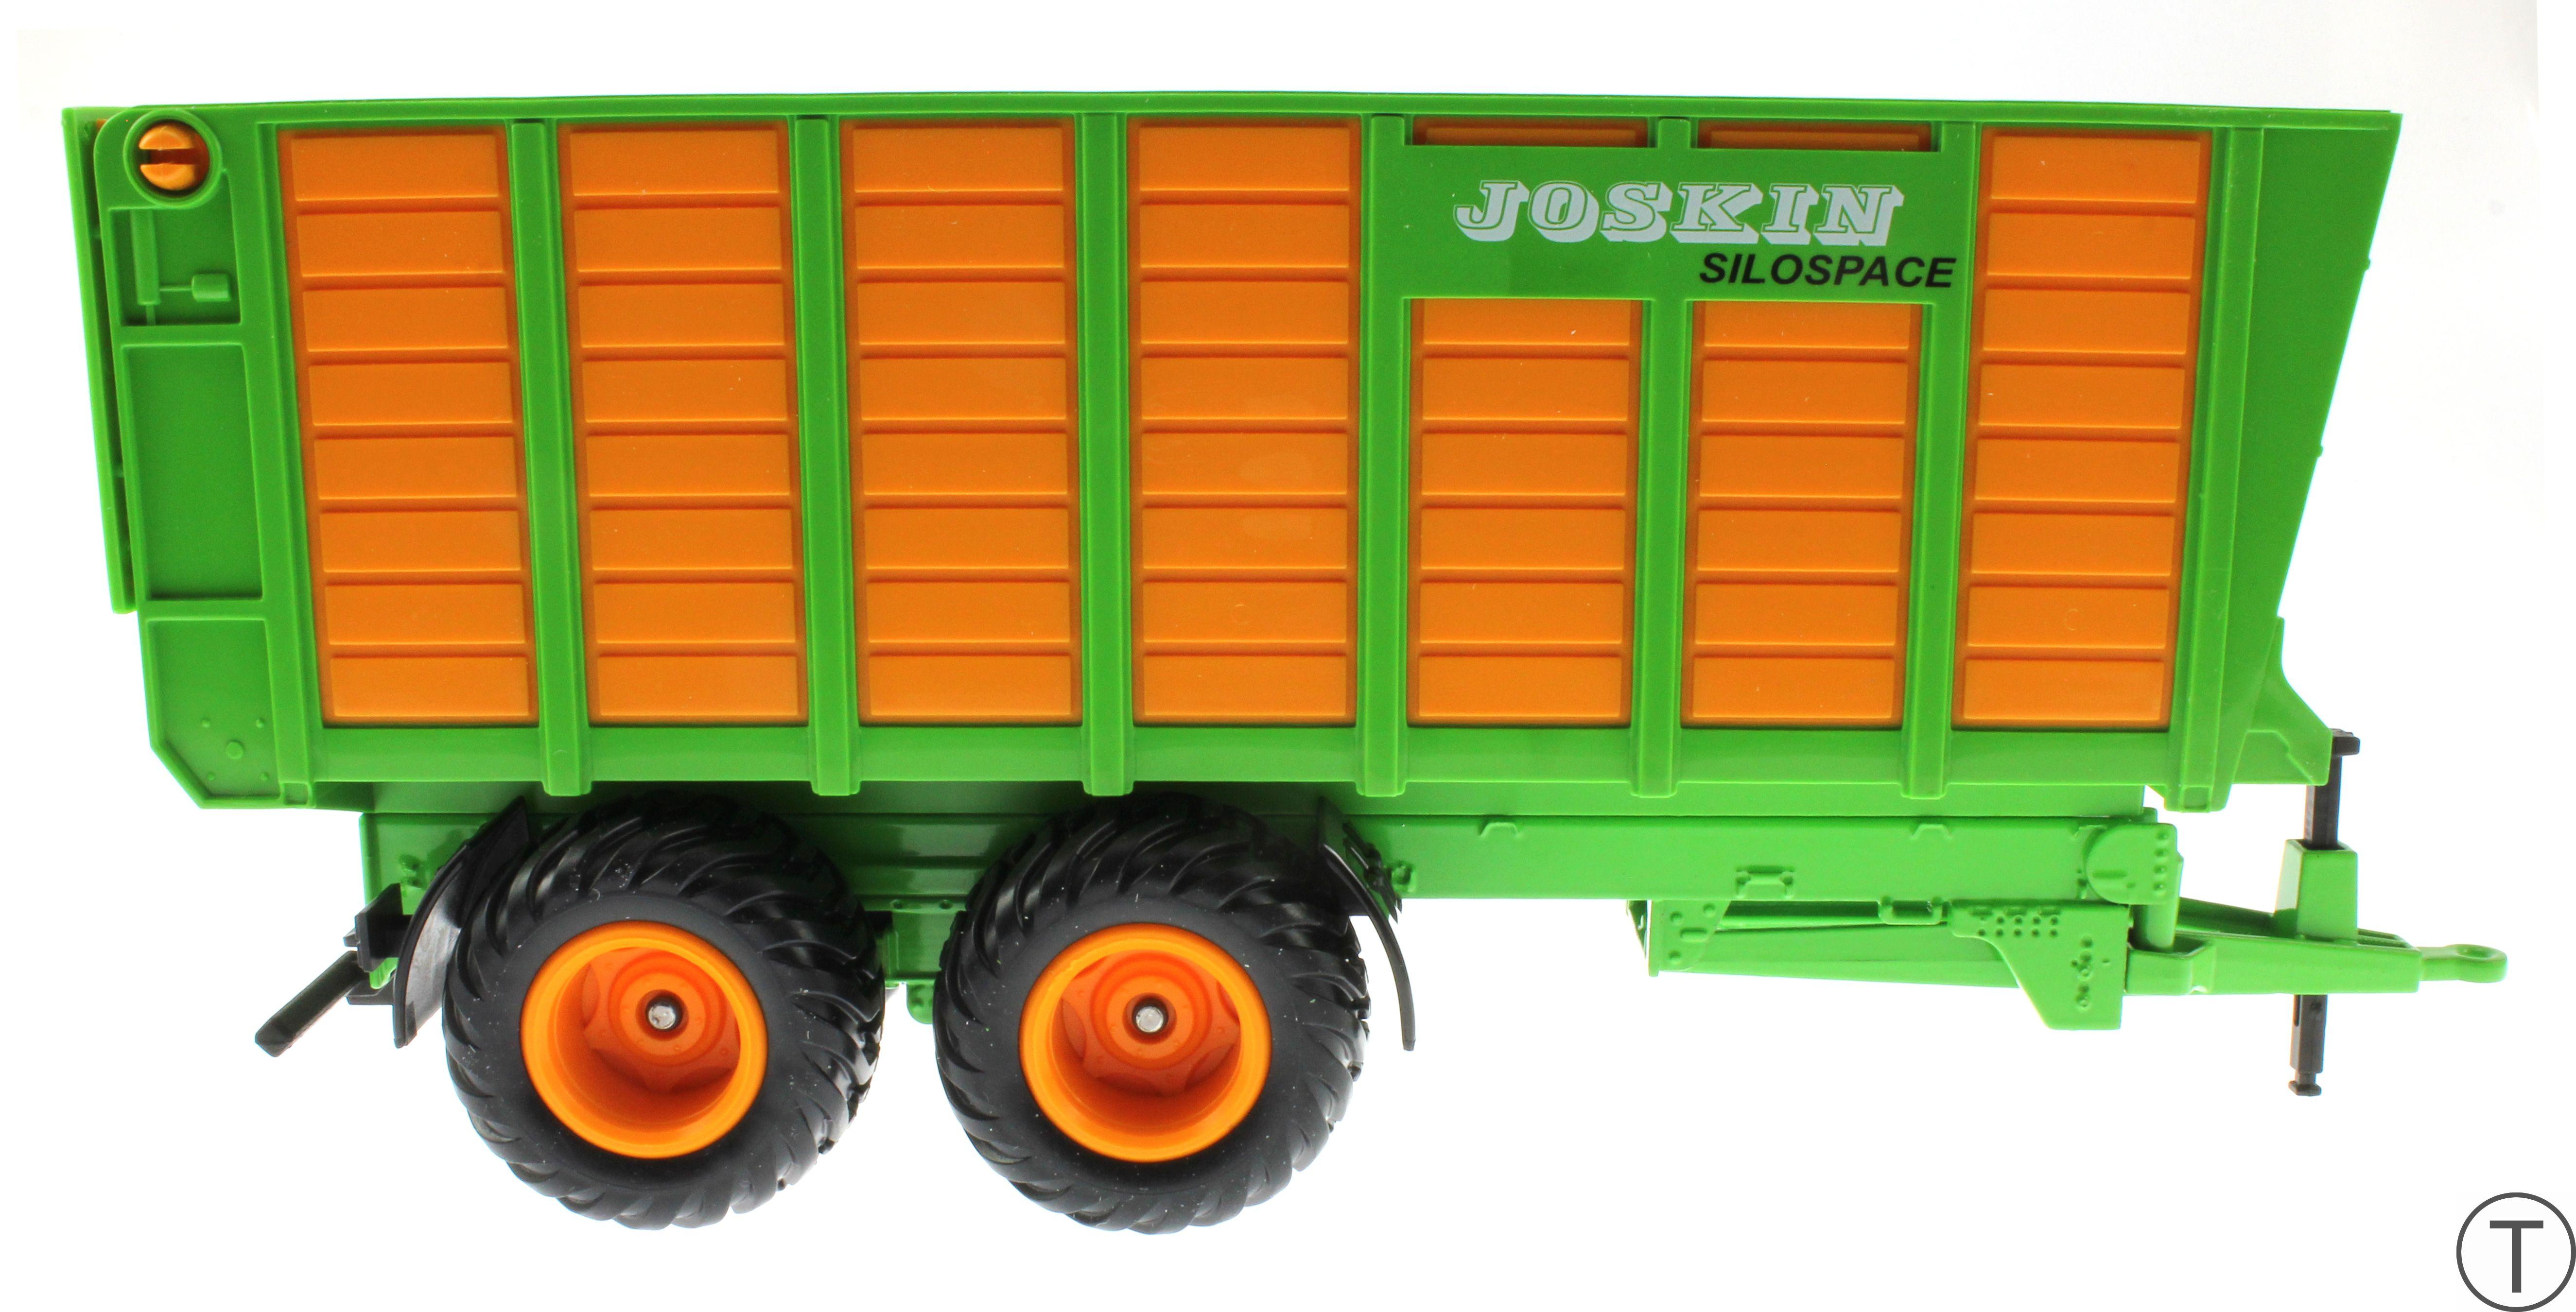 Siku 2873 - Silagewagen Joskin Silospace